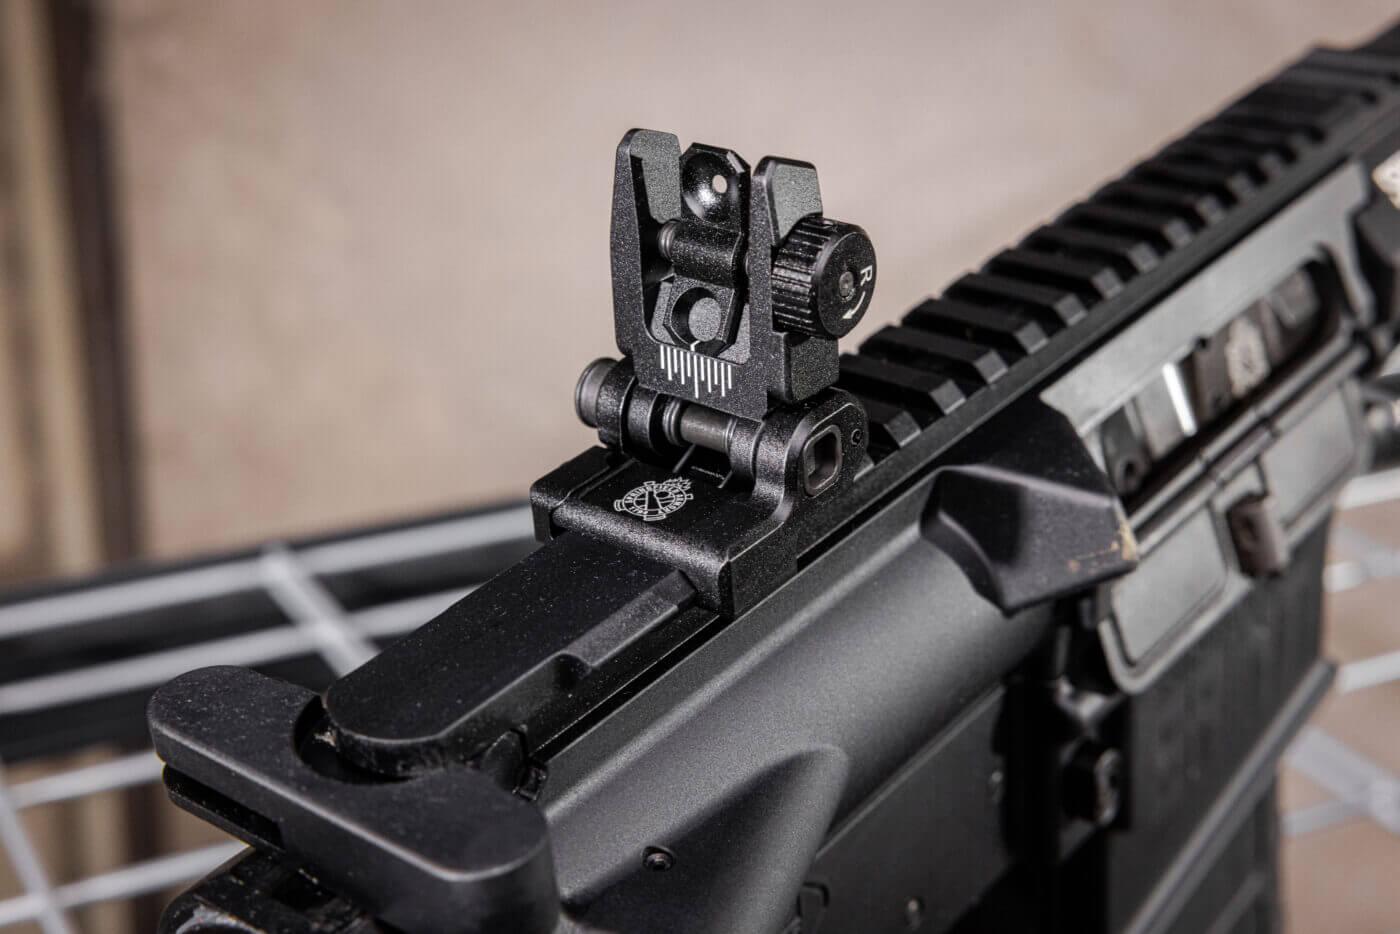 SAINT Victor rifle .308 rear sight